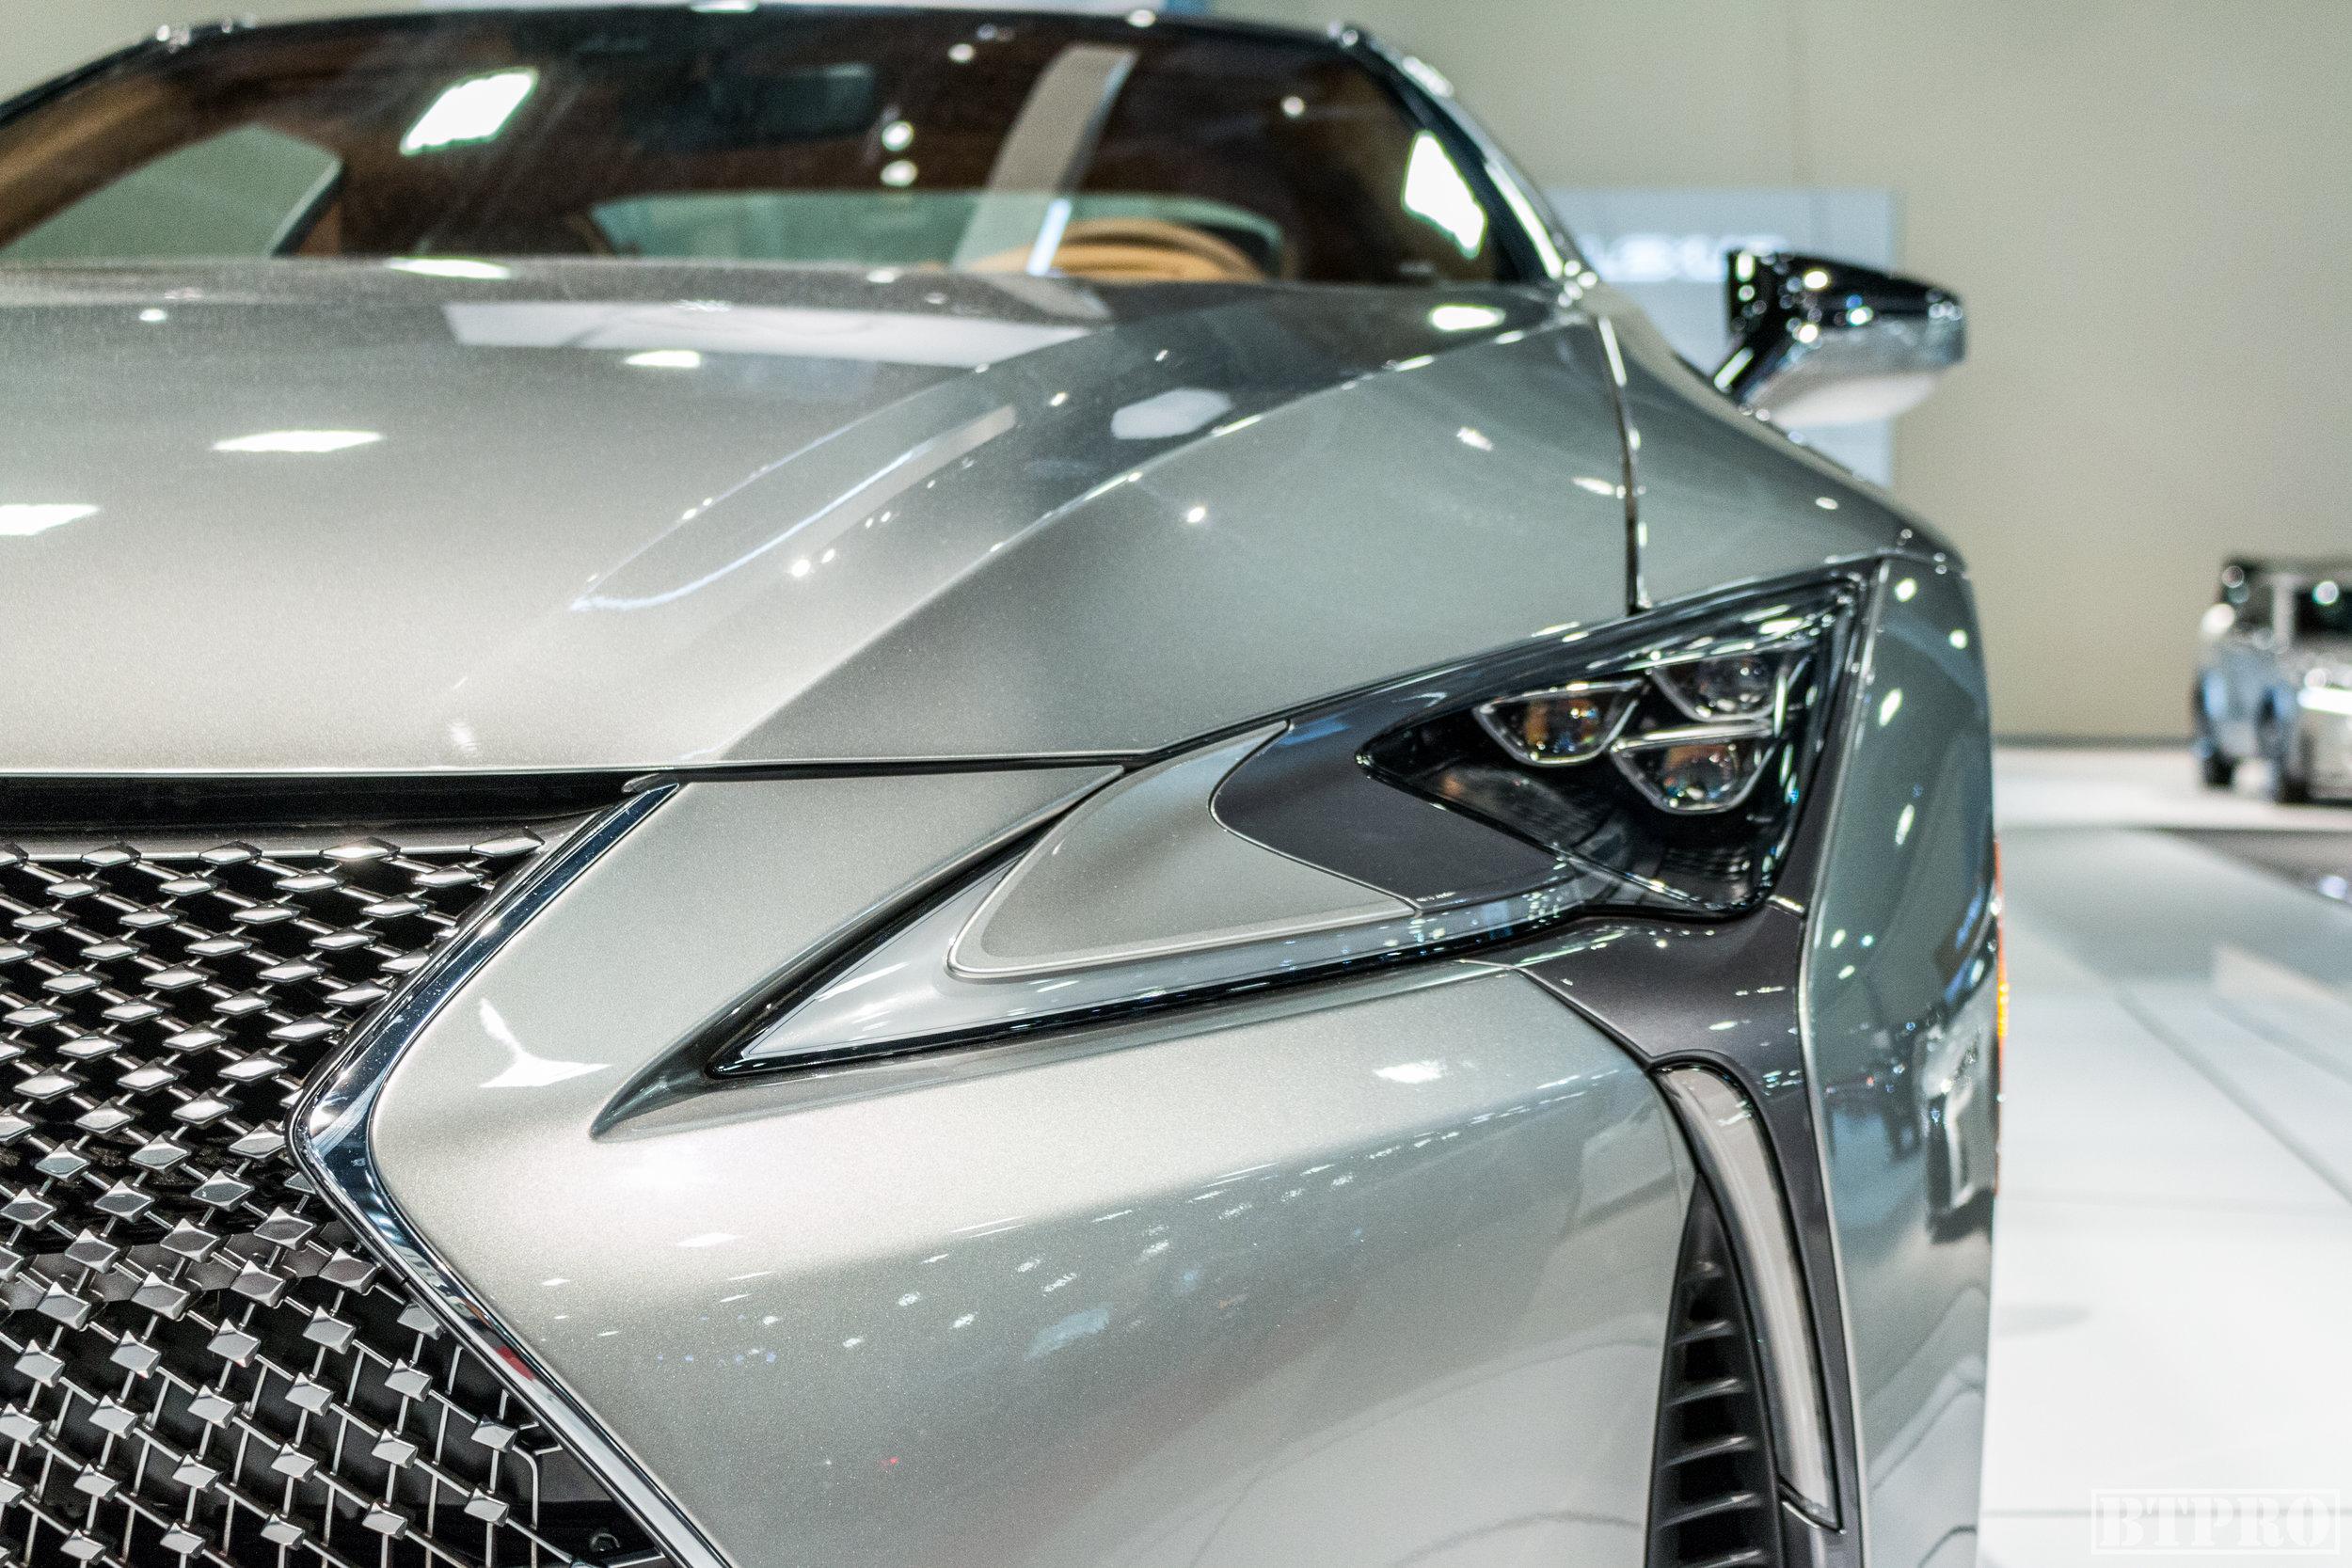 lexus, lexus lc500 lexus hybrid, hybrid car, car show, miami, miami international car show, miami international auto show, auto show, exotic cars, muscle cars, car photography